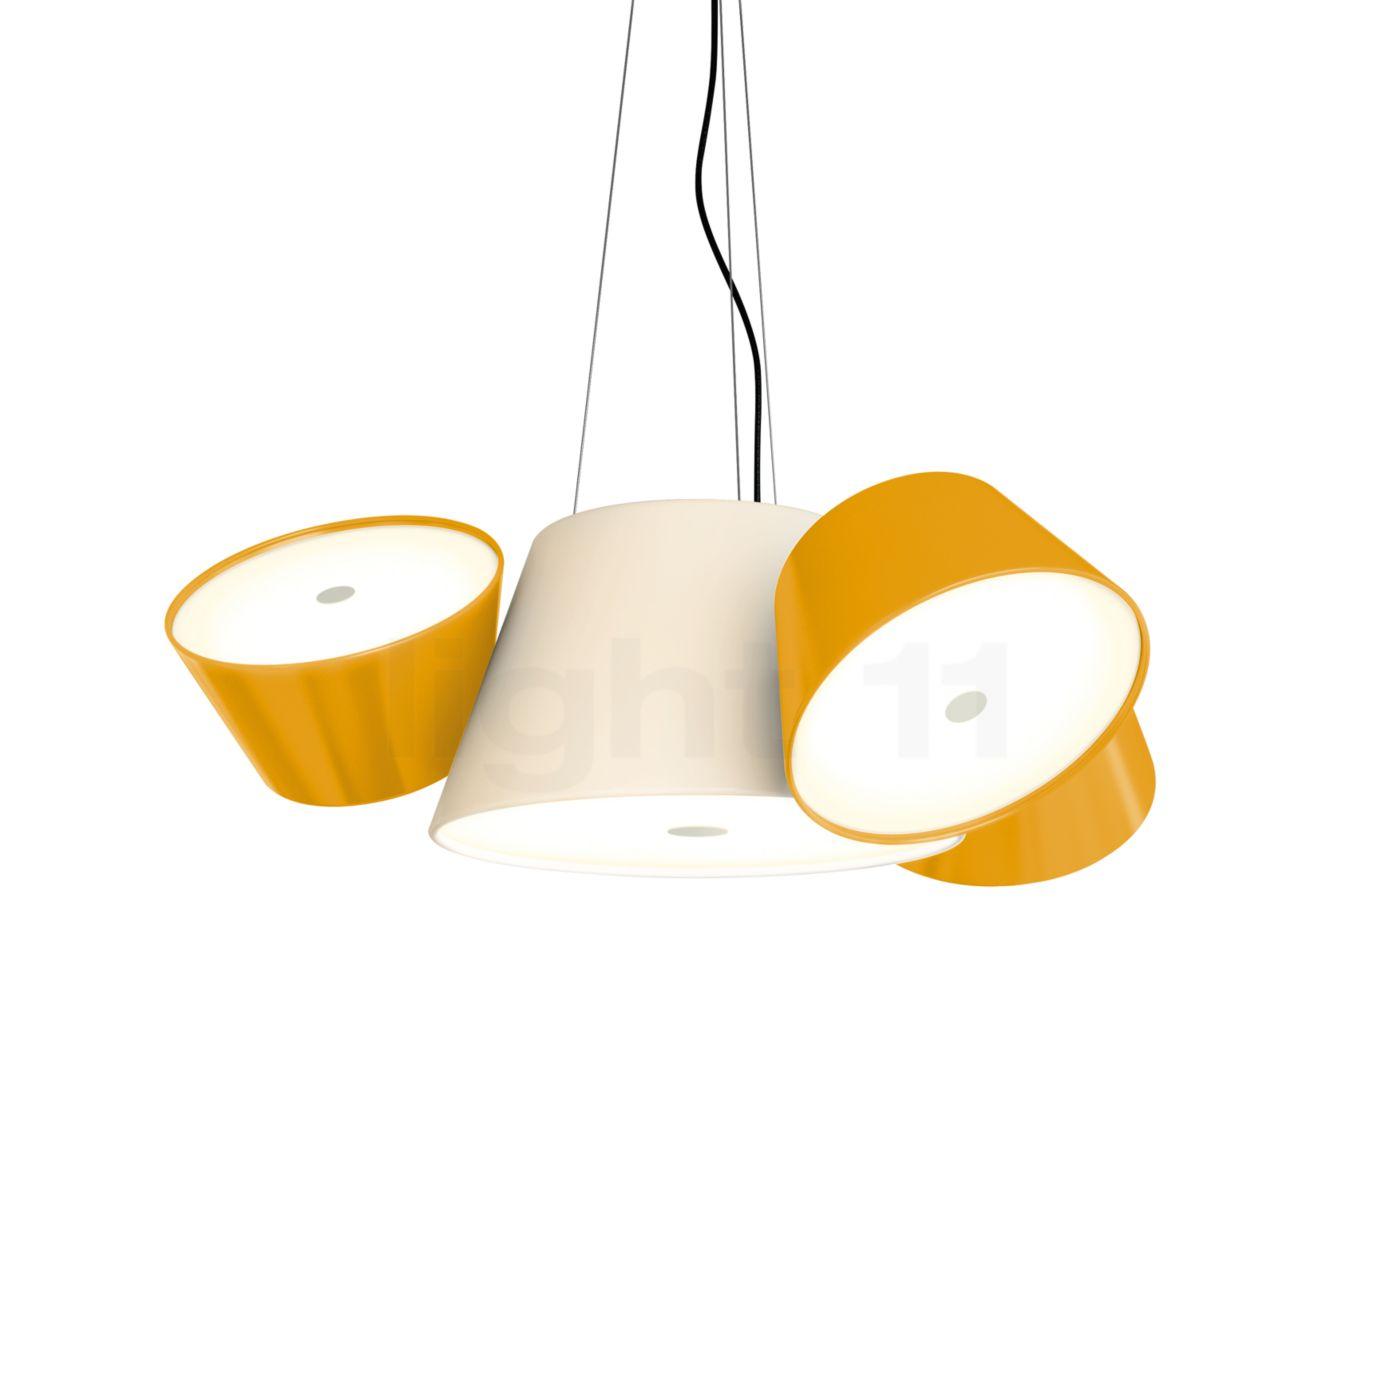 Marset Tam Tam Mini, gebrochenes weiß/orange A633-012 35 + 3xA633-011 46